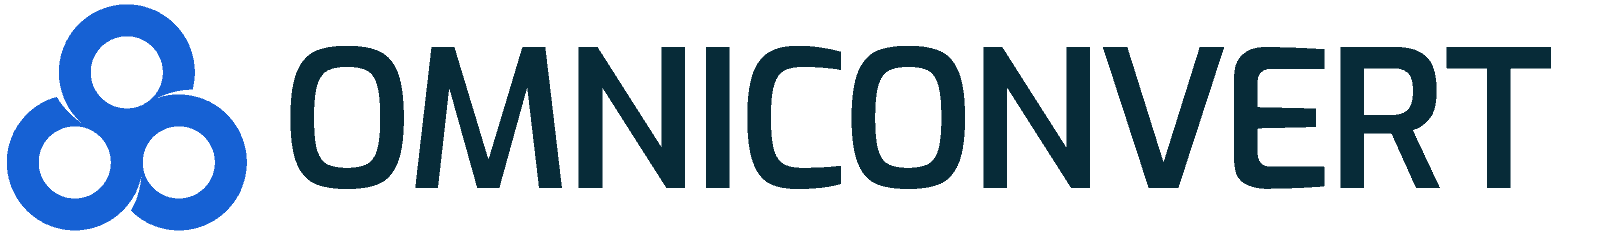 logo-omniconvert-color.png